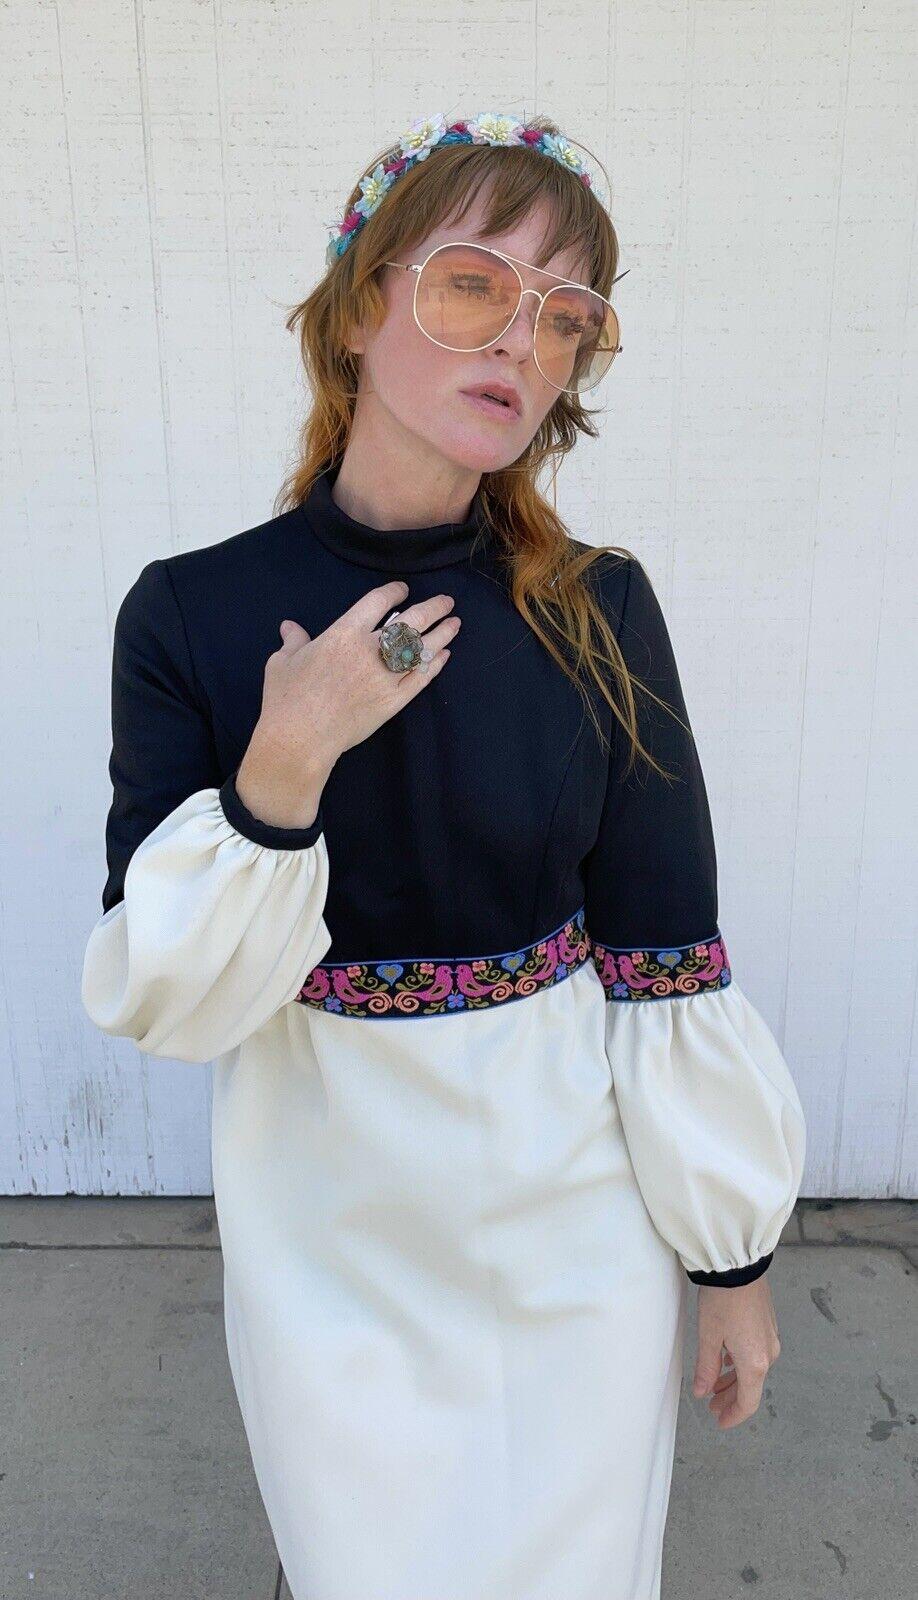 Vintage Fairycore Maxi Dress Hippie Clothes Puffy… - image 5